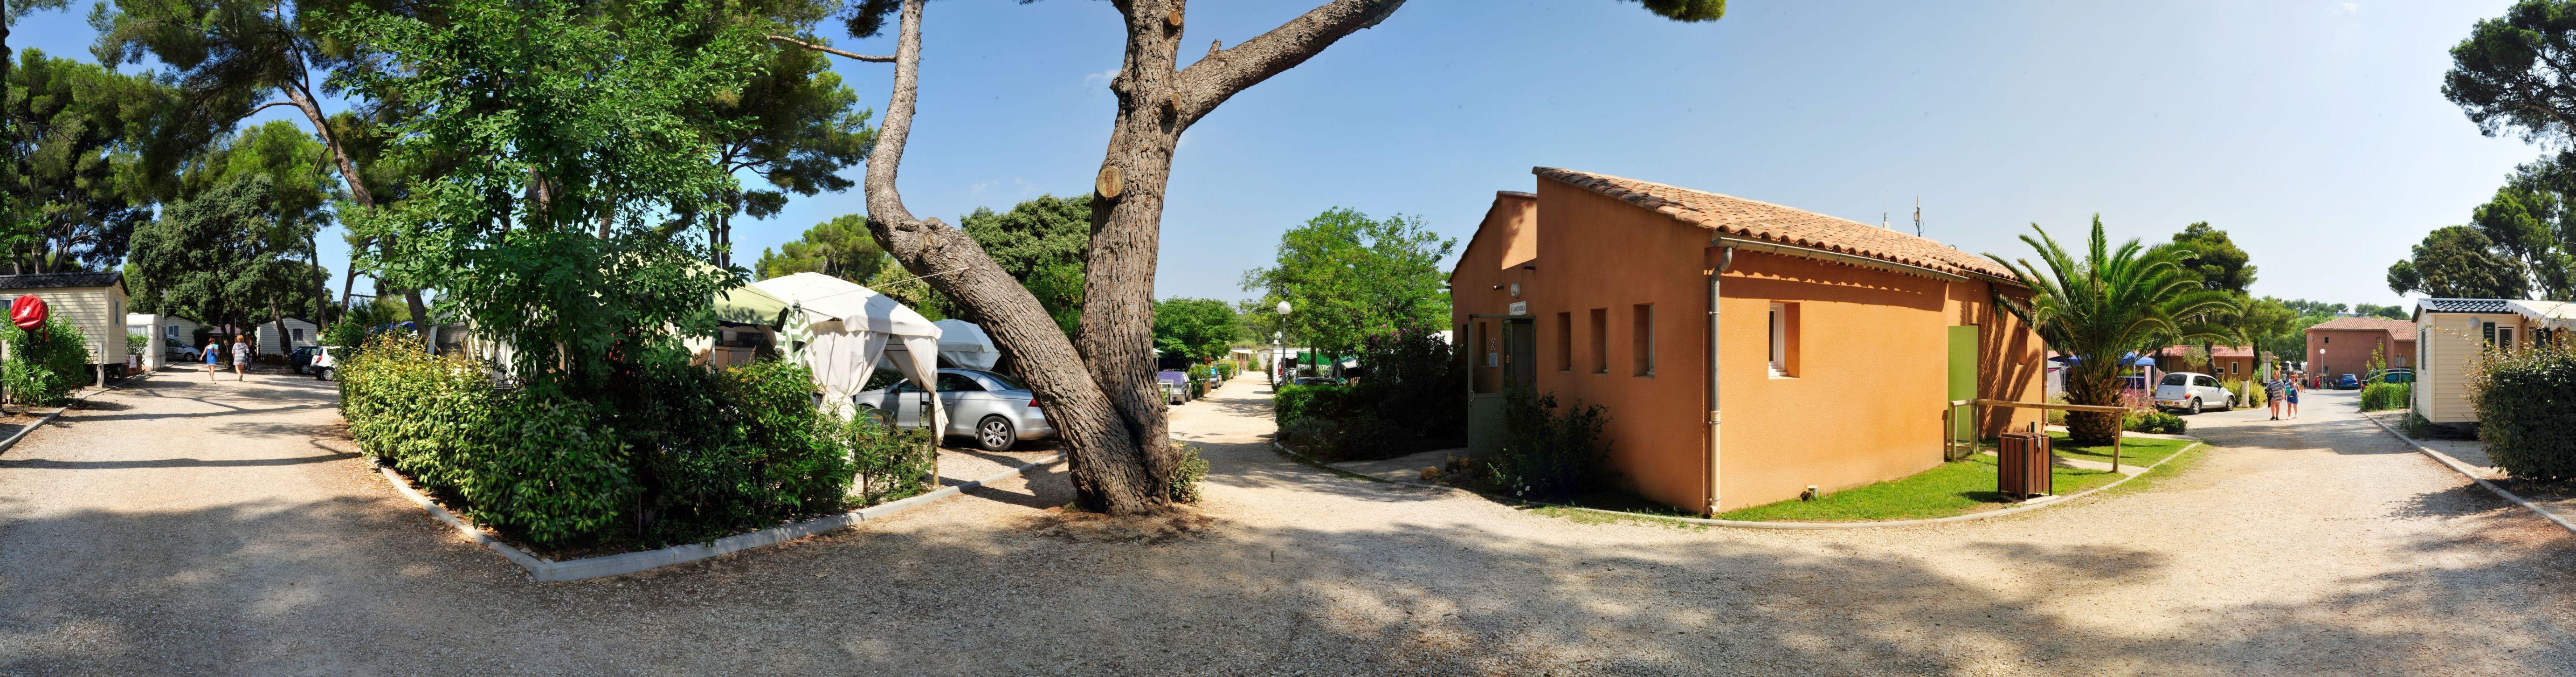 Camping-Pascalounet-Camping-pano1-50min